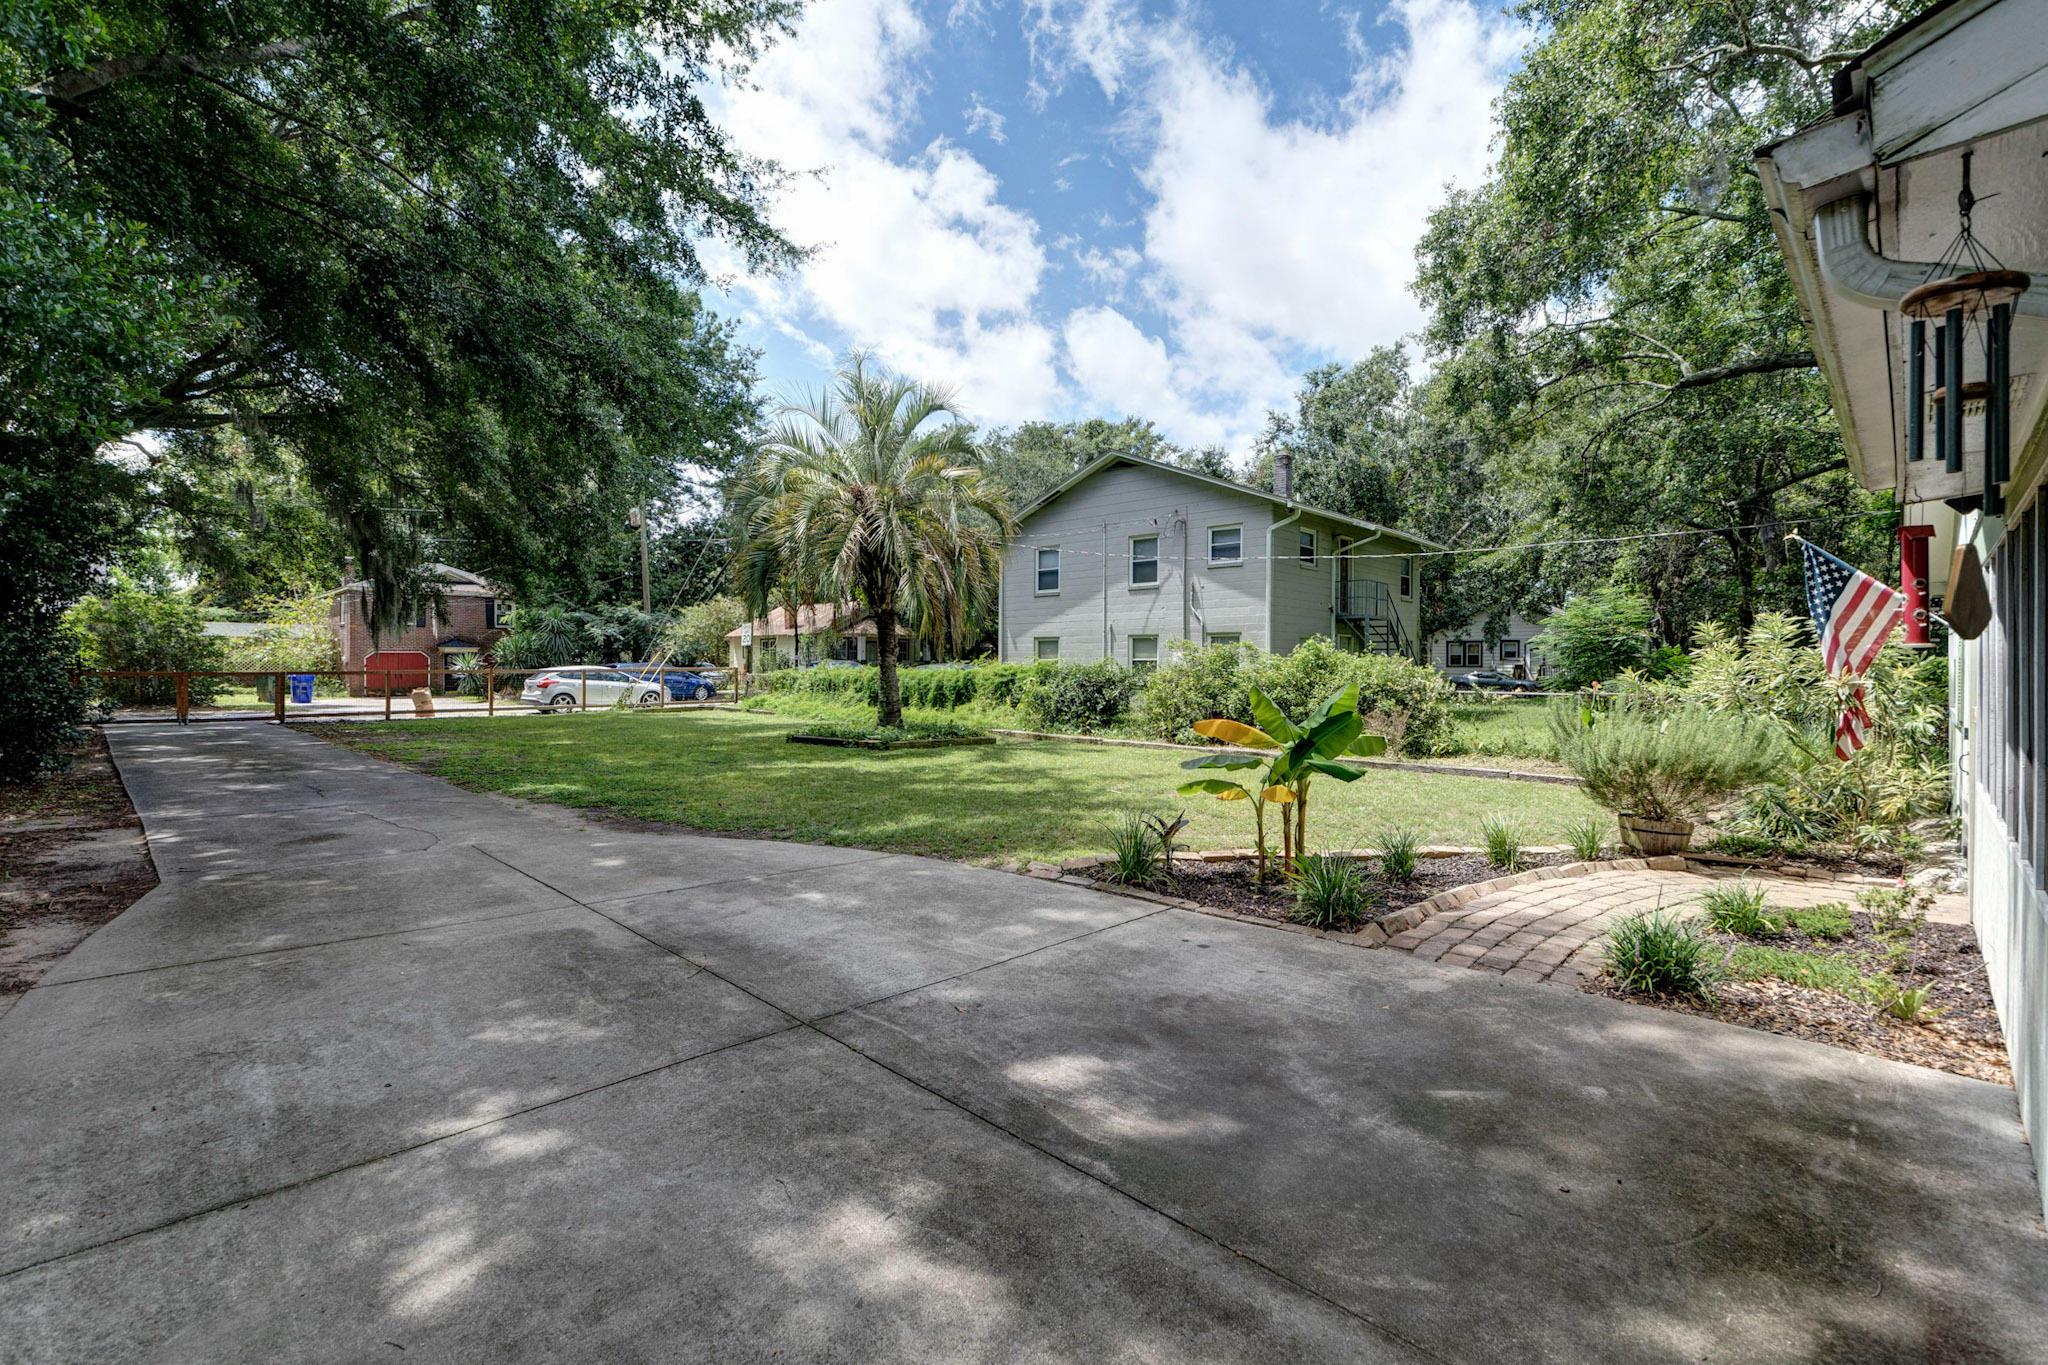 St Andrews Homes For Sale - 1808 2nd, Charleston, SC - 30